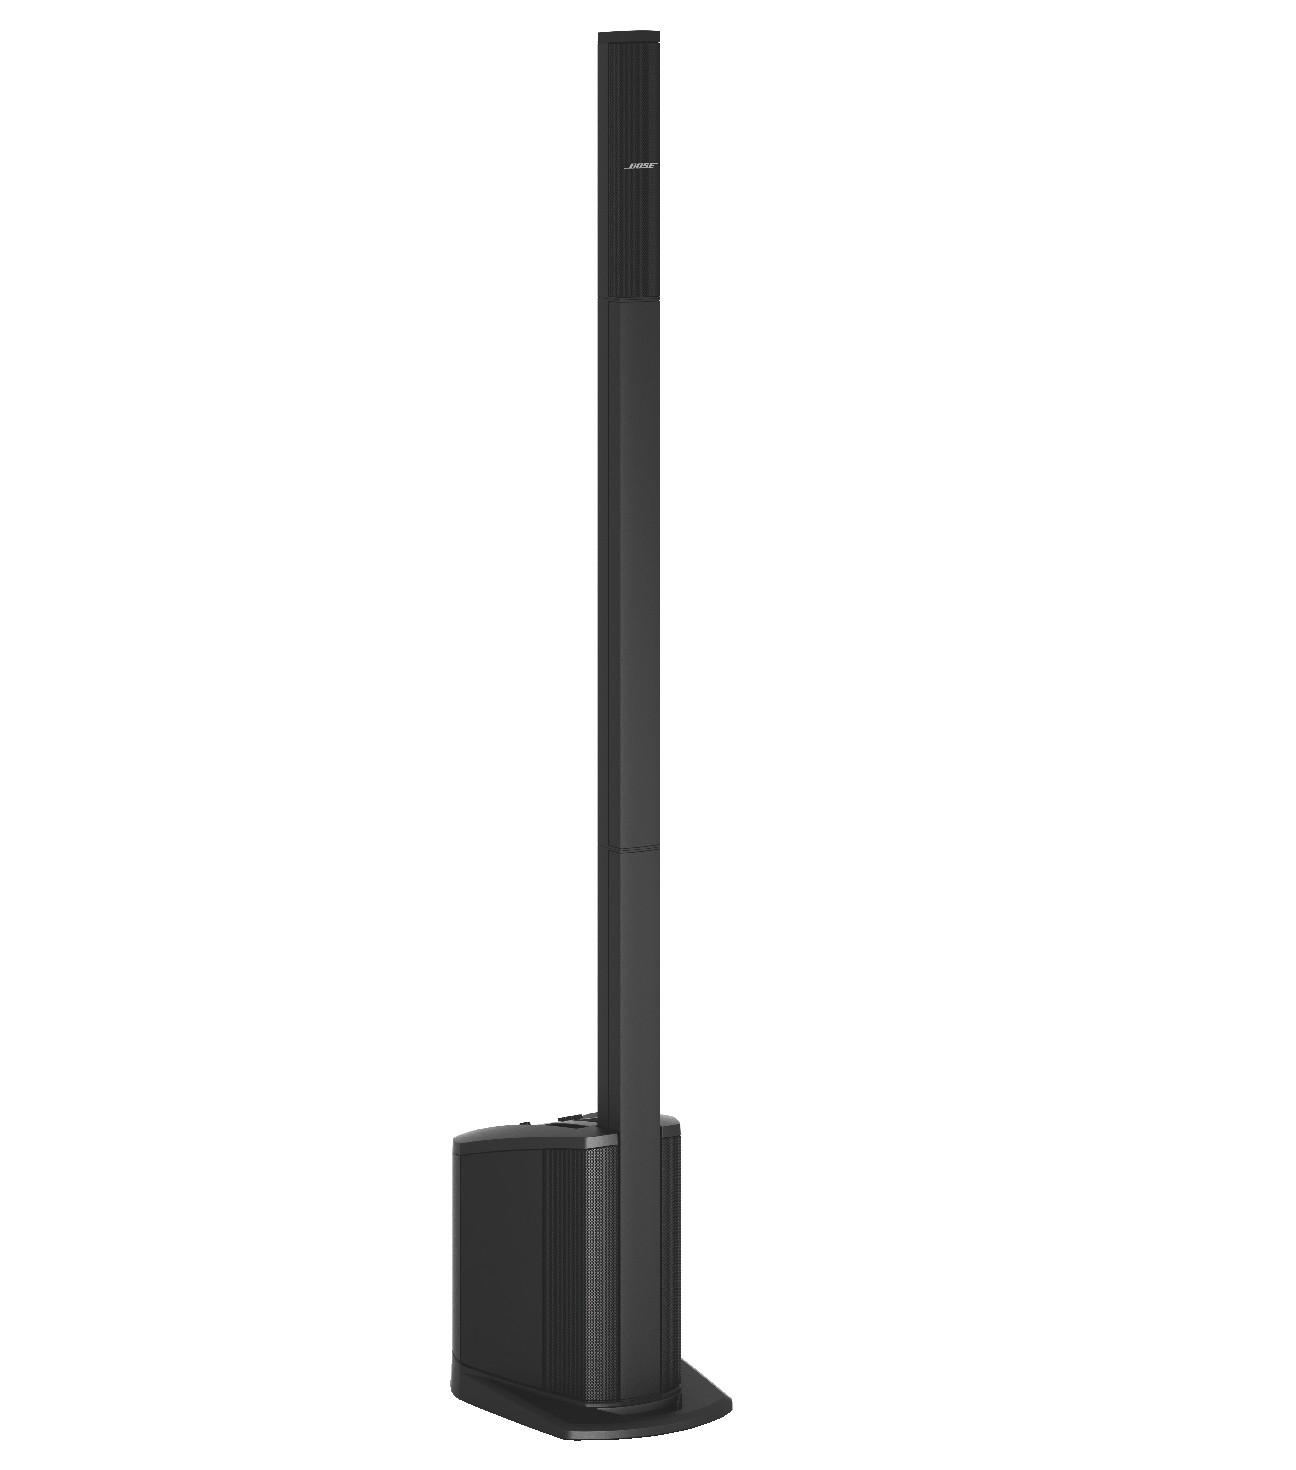 Profi- / Musiker-Equipment Bose L1 Compact im Test, Bild 3